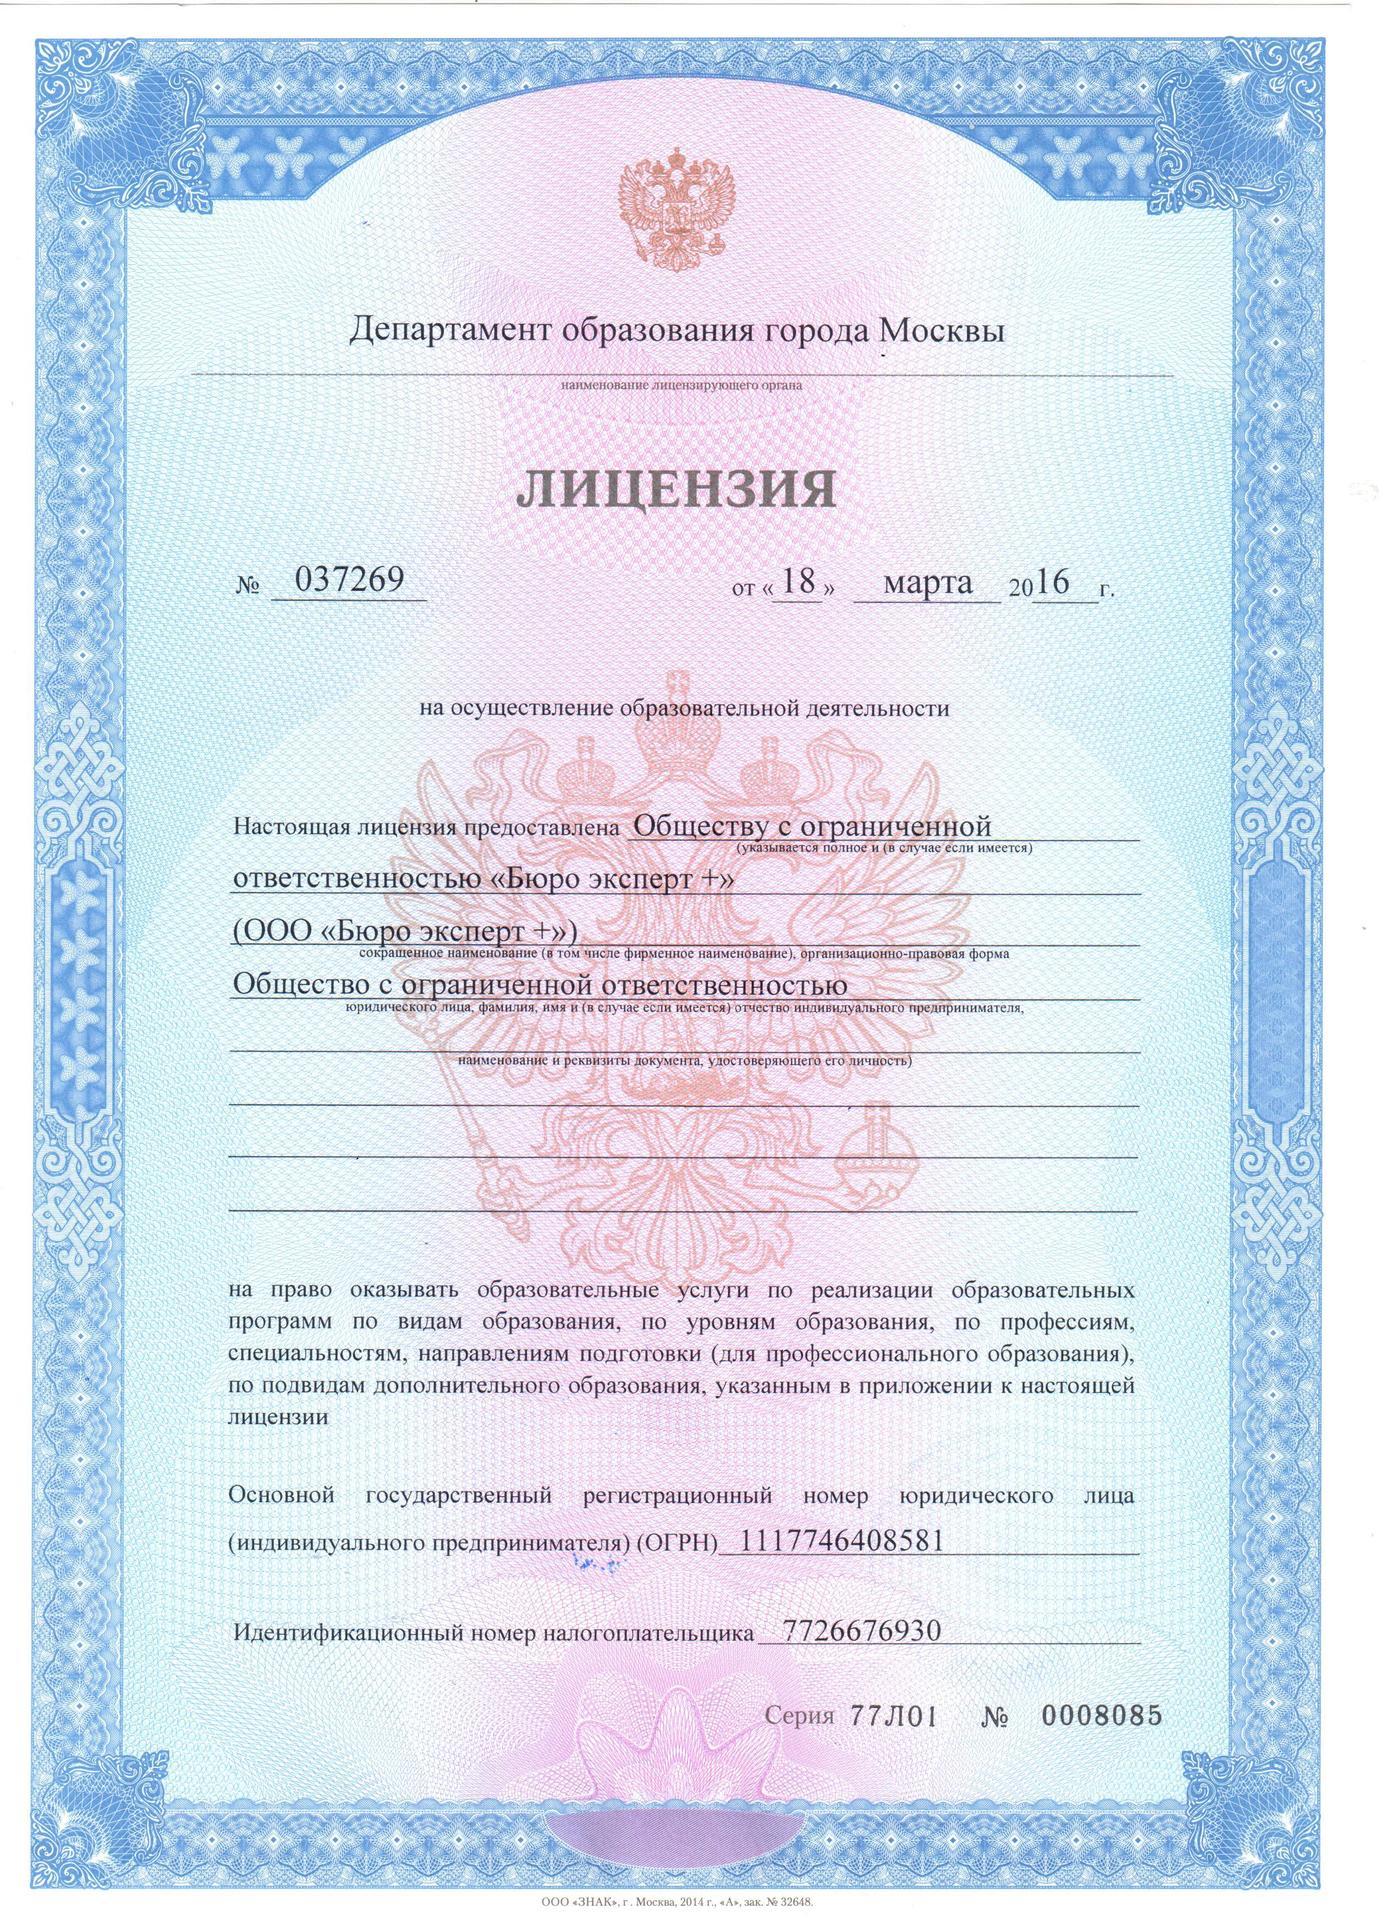 buro-expert_license